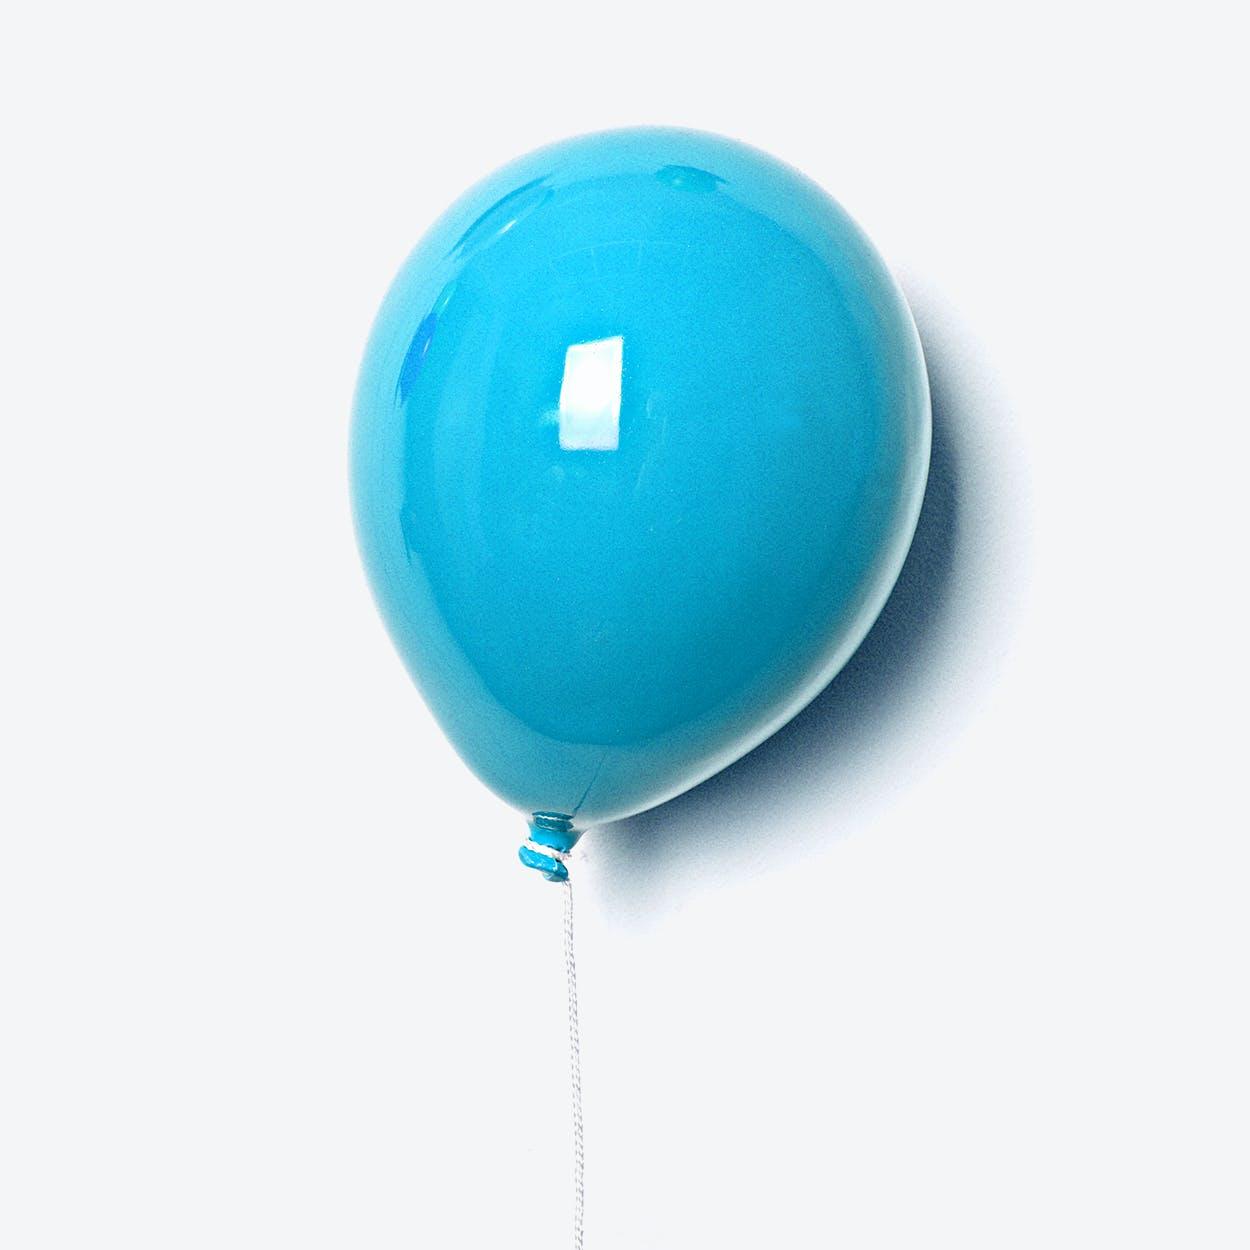 Ceramic Balloon Wall Decor in Sky Blue